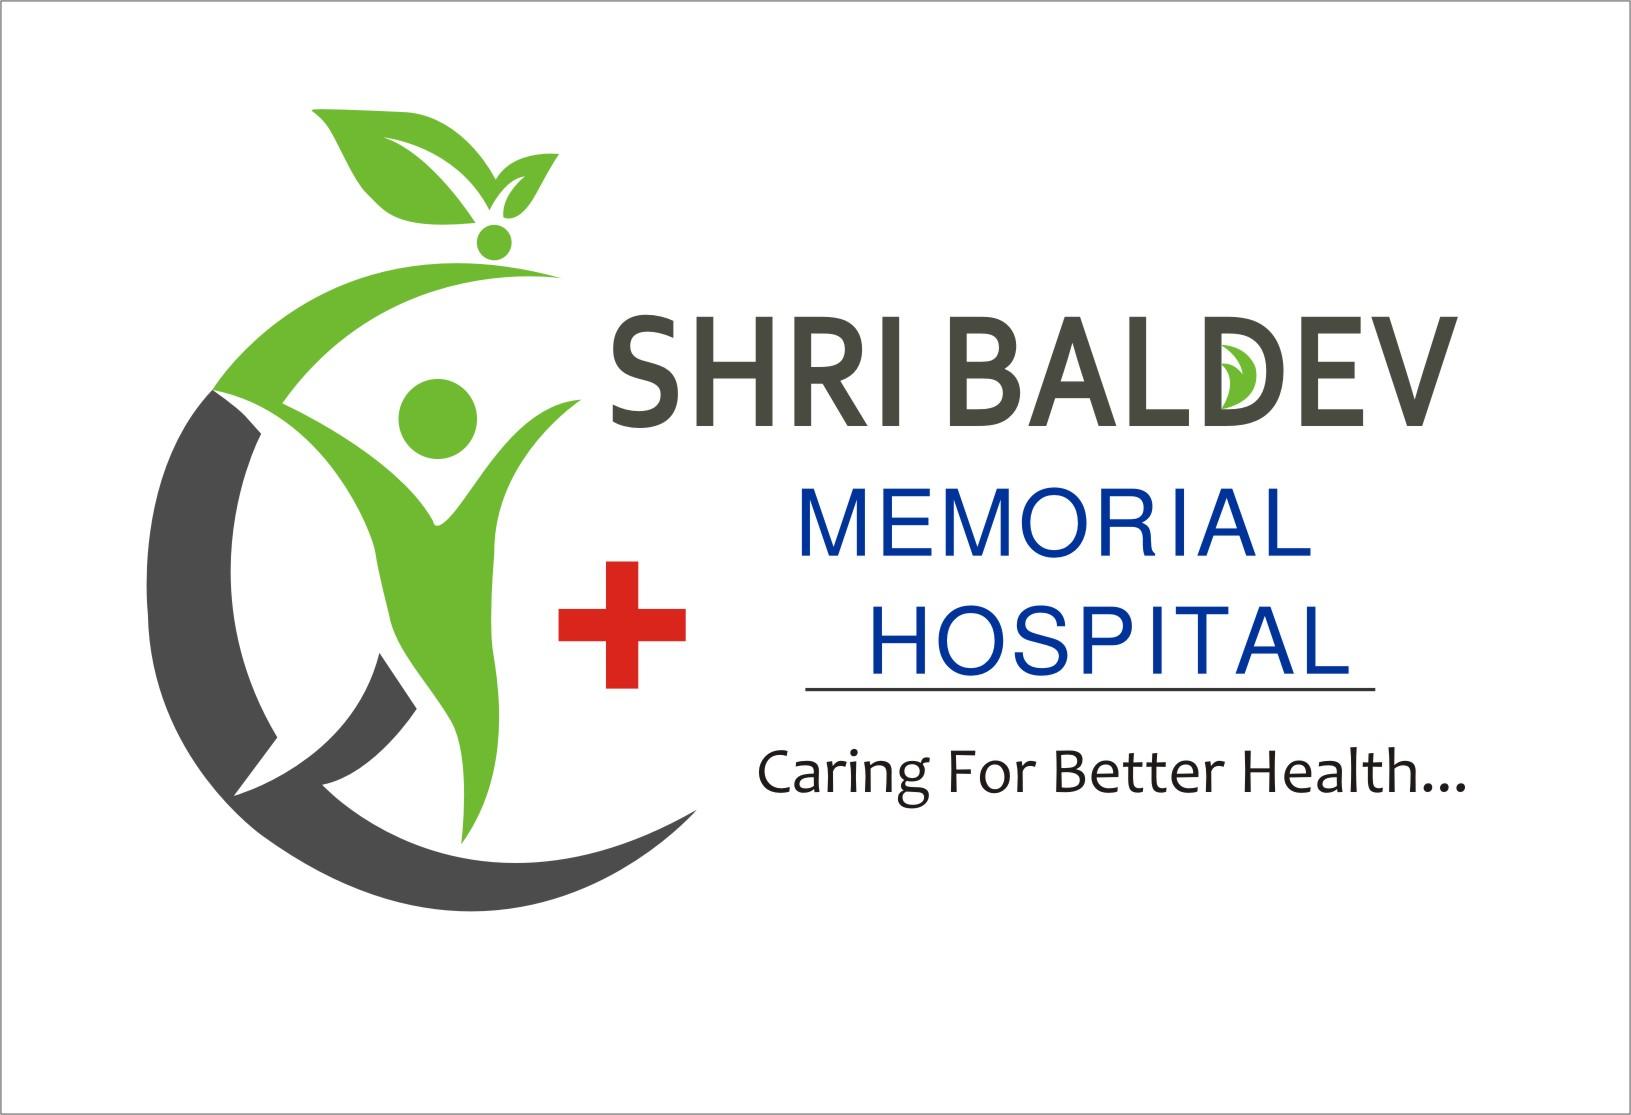 Shri Baldev Memorial Hospital